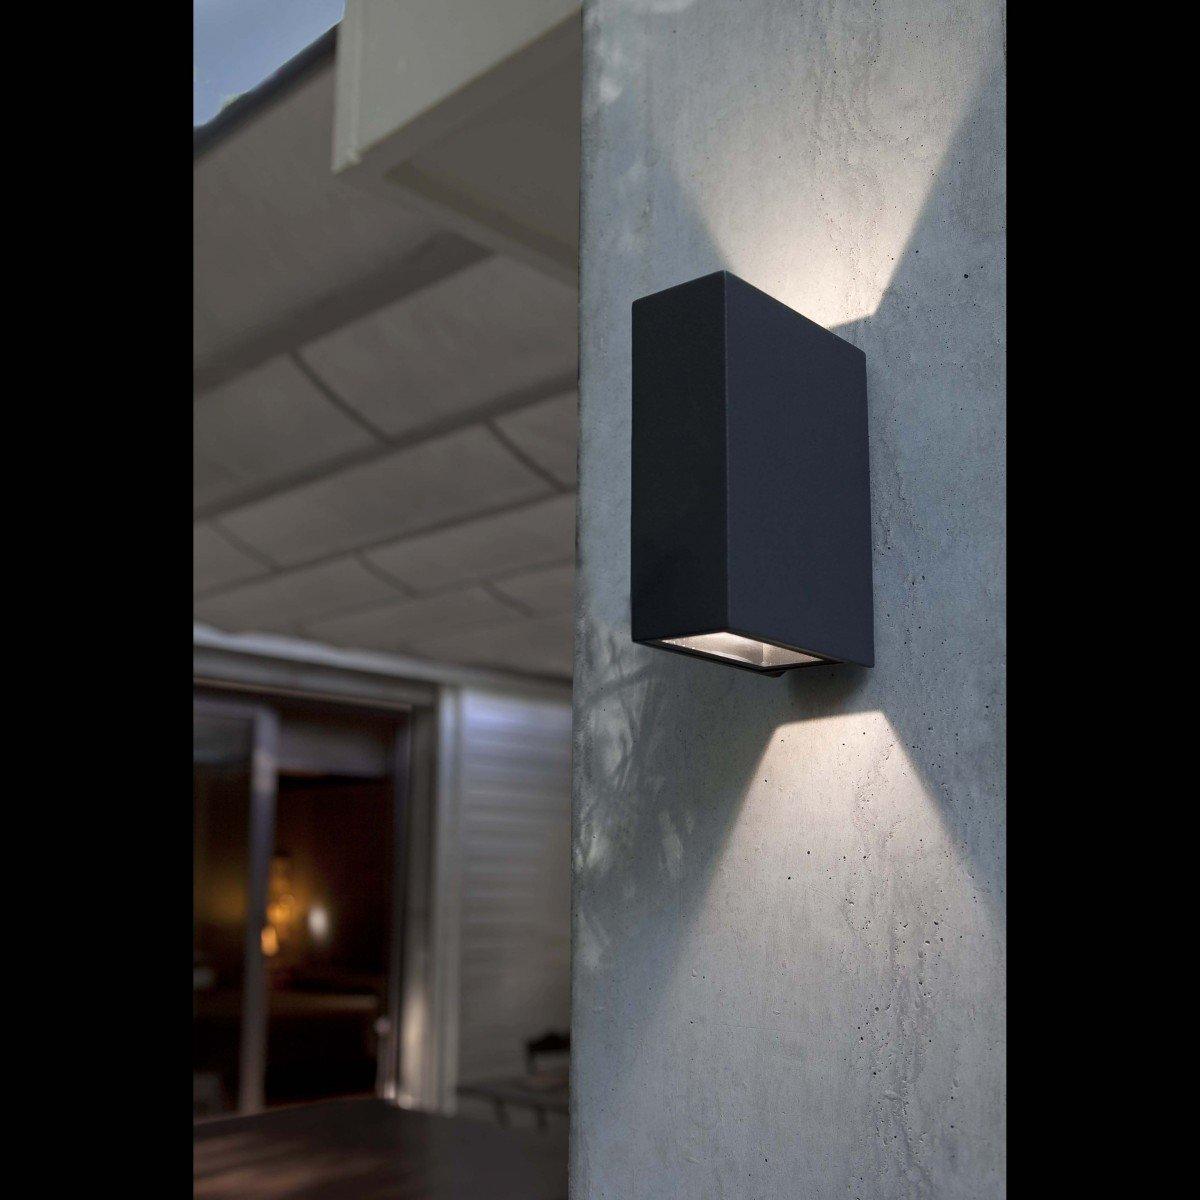 Faro crata led l mpara aplique gris oscuro 70568 for Aplique exterior led